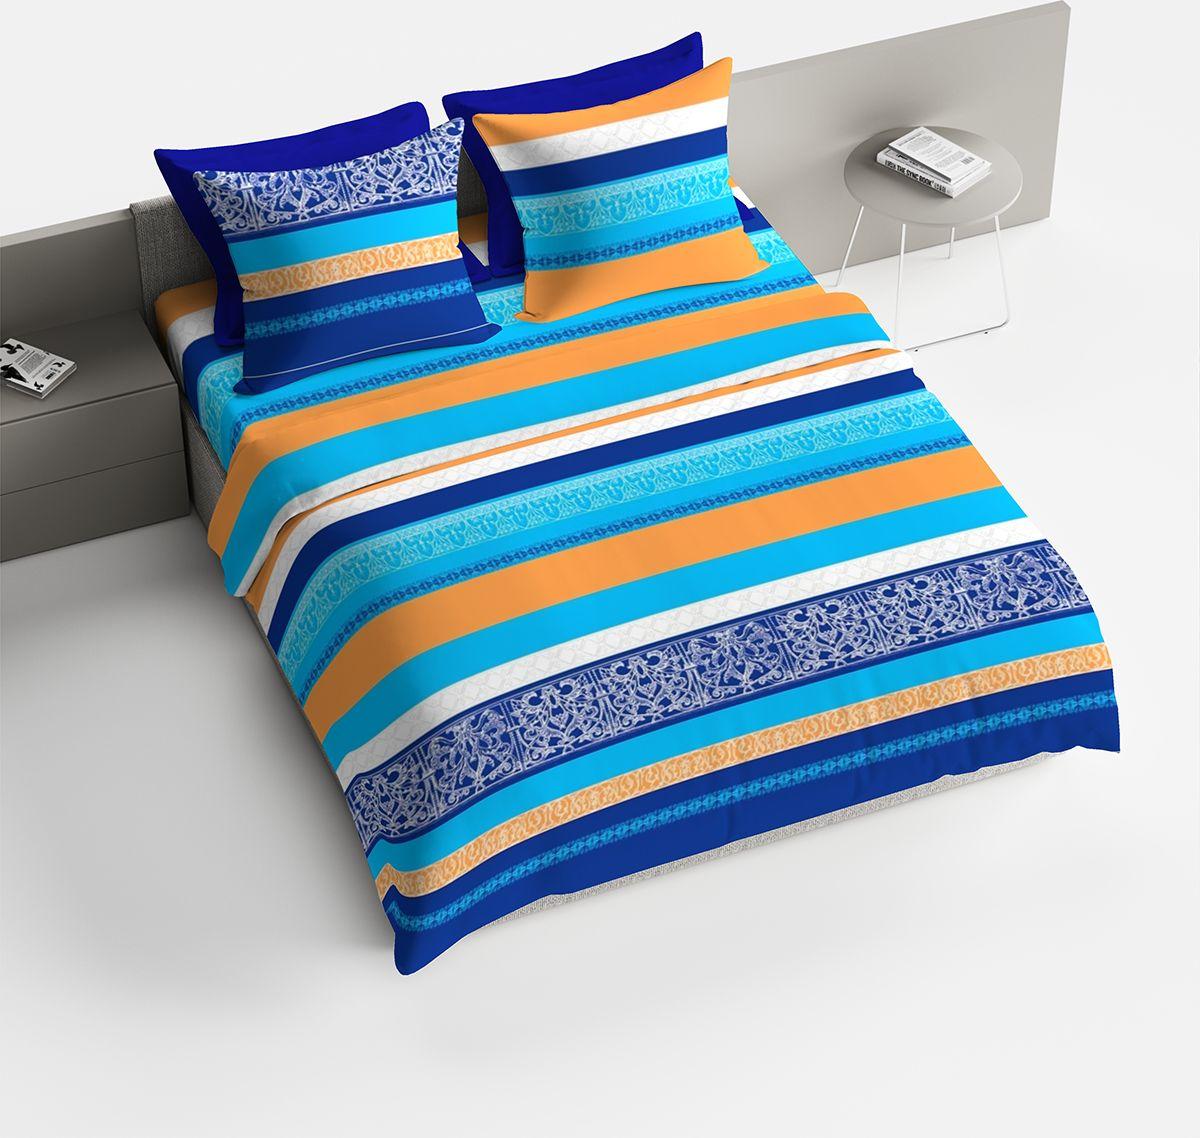 Комплект белья Браво Гретхен, 2-х спальное, наволочки 70x70, цвет: синий. 4060-187740